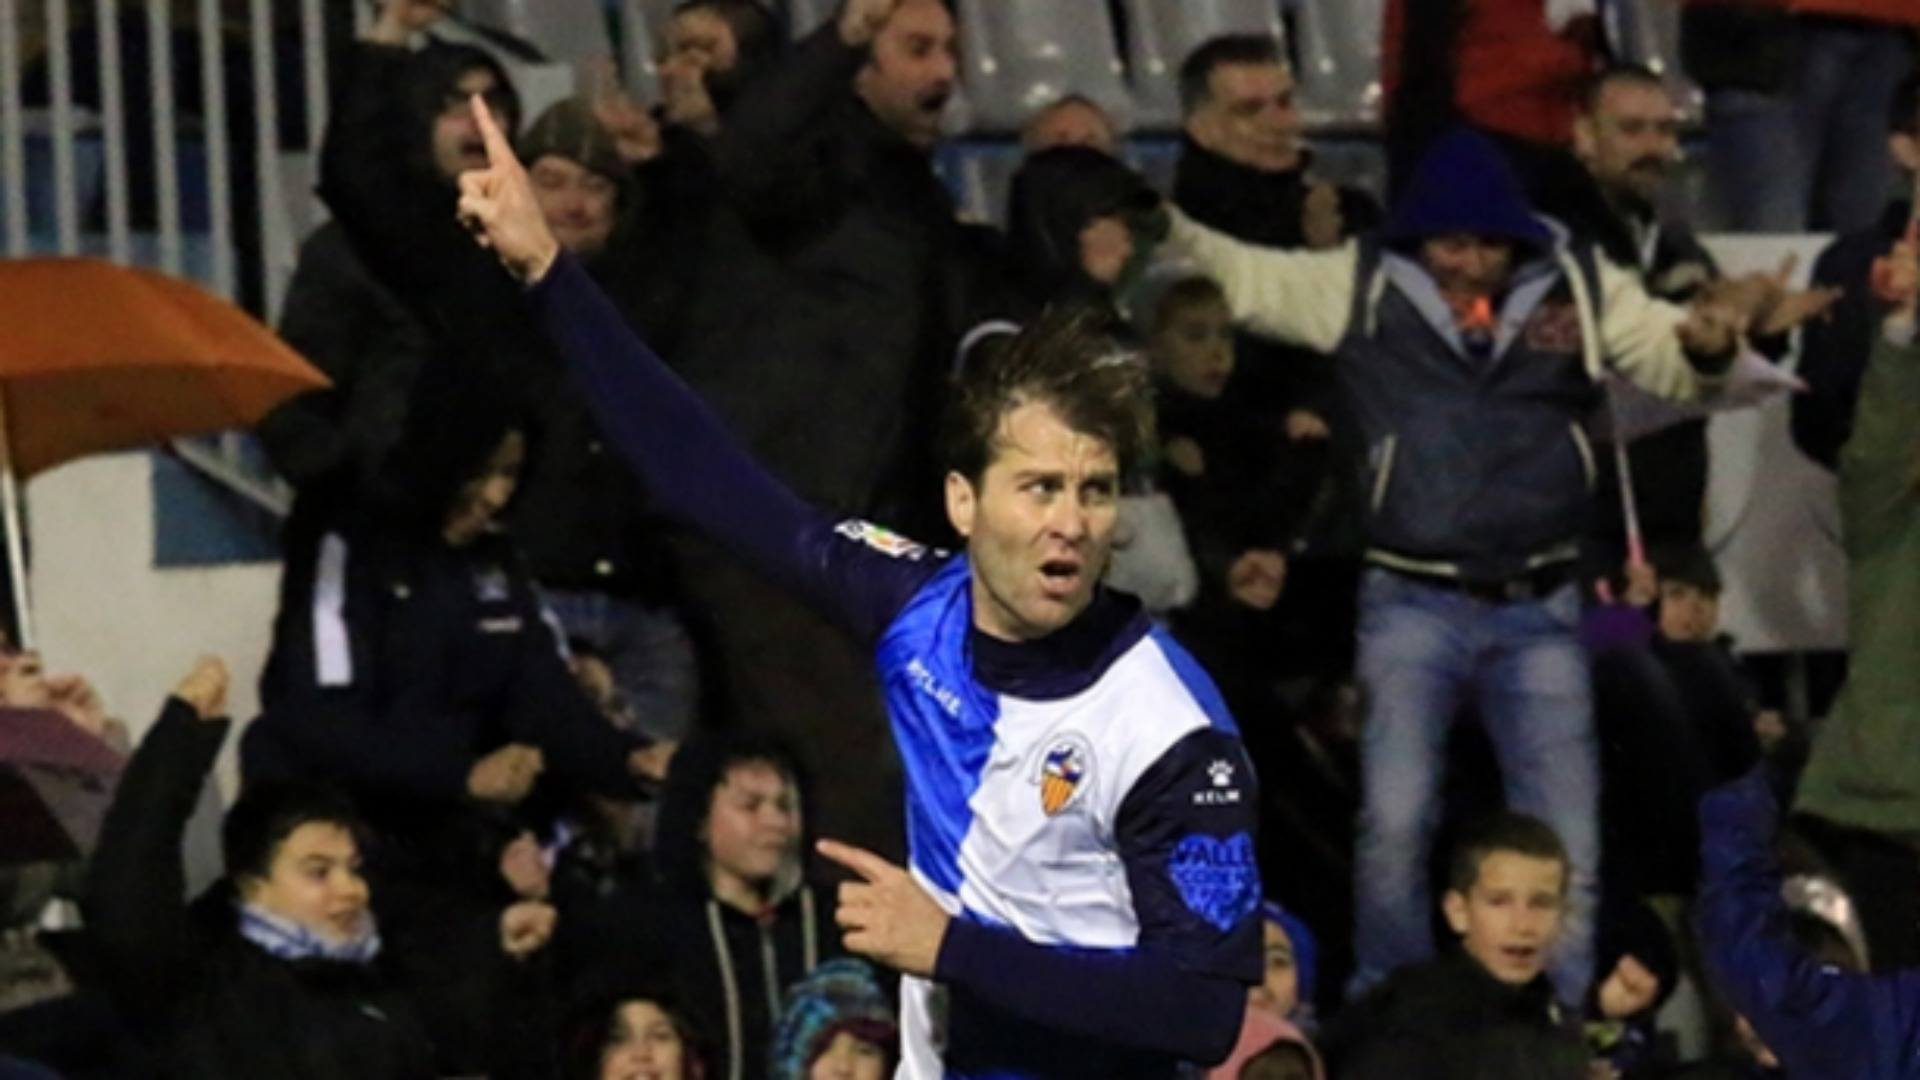 Image Result For Vivo Celta Vigo Vs Getafe Streaming En Vivo Champions